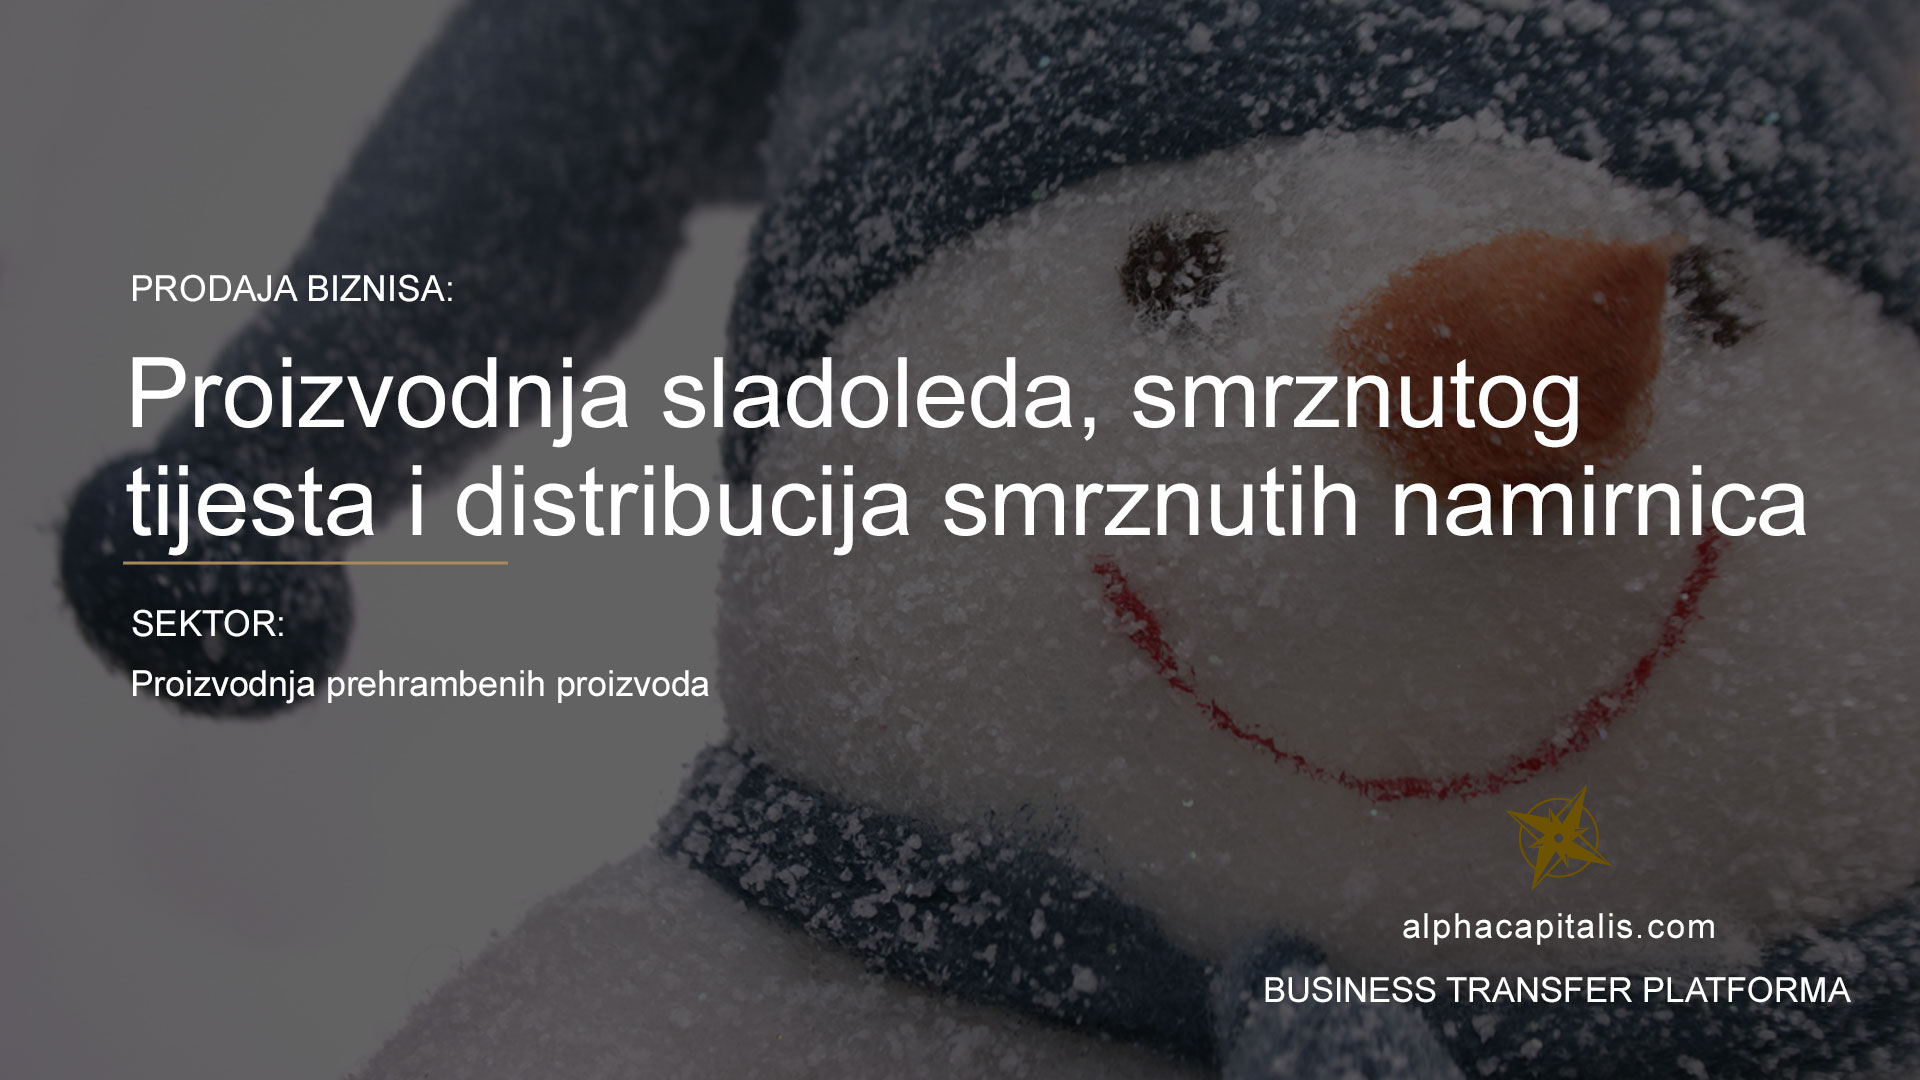 alpha-capitalis-business-transfer-platforma-prodaja